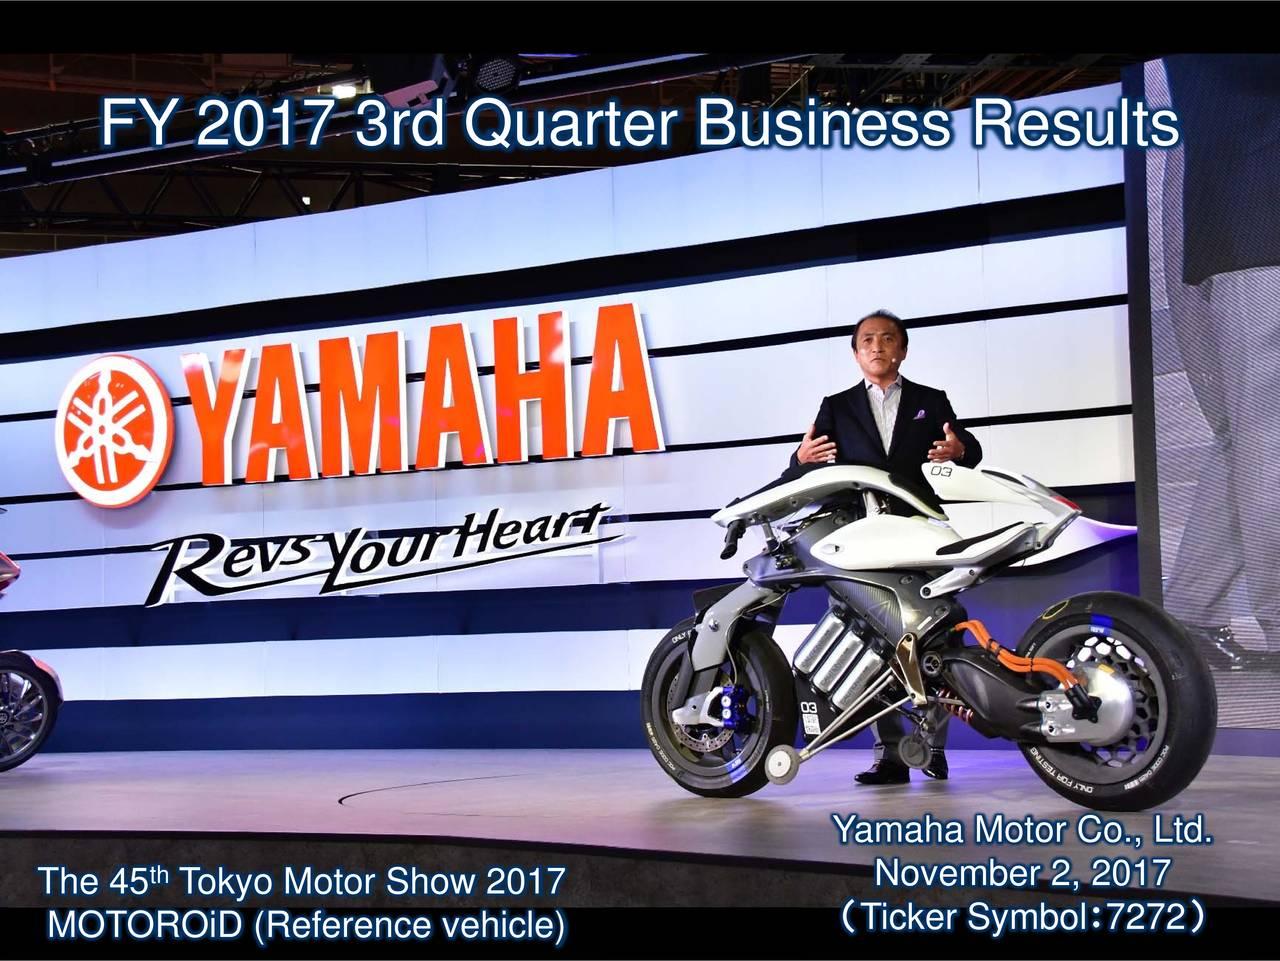 small resolution of yamaha motor co ltd adr 2017 q3 results earnings call slides